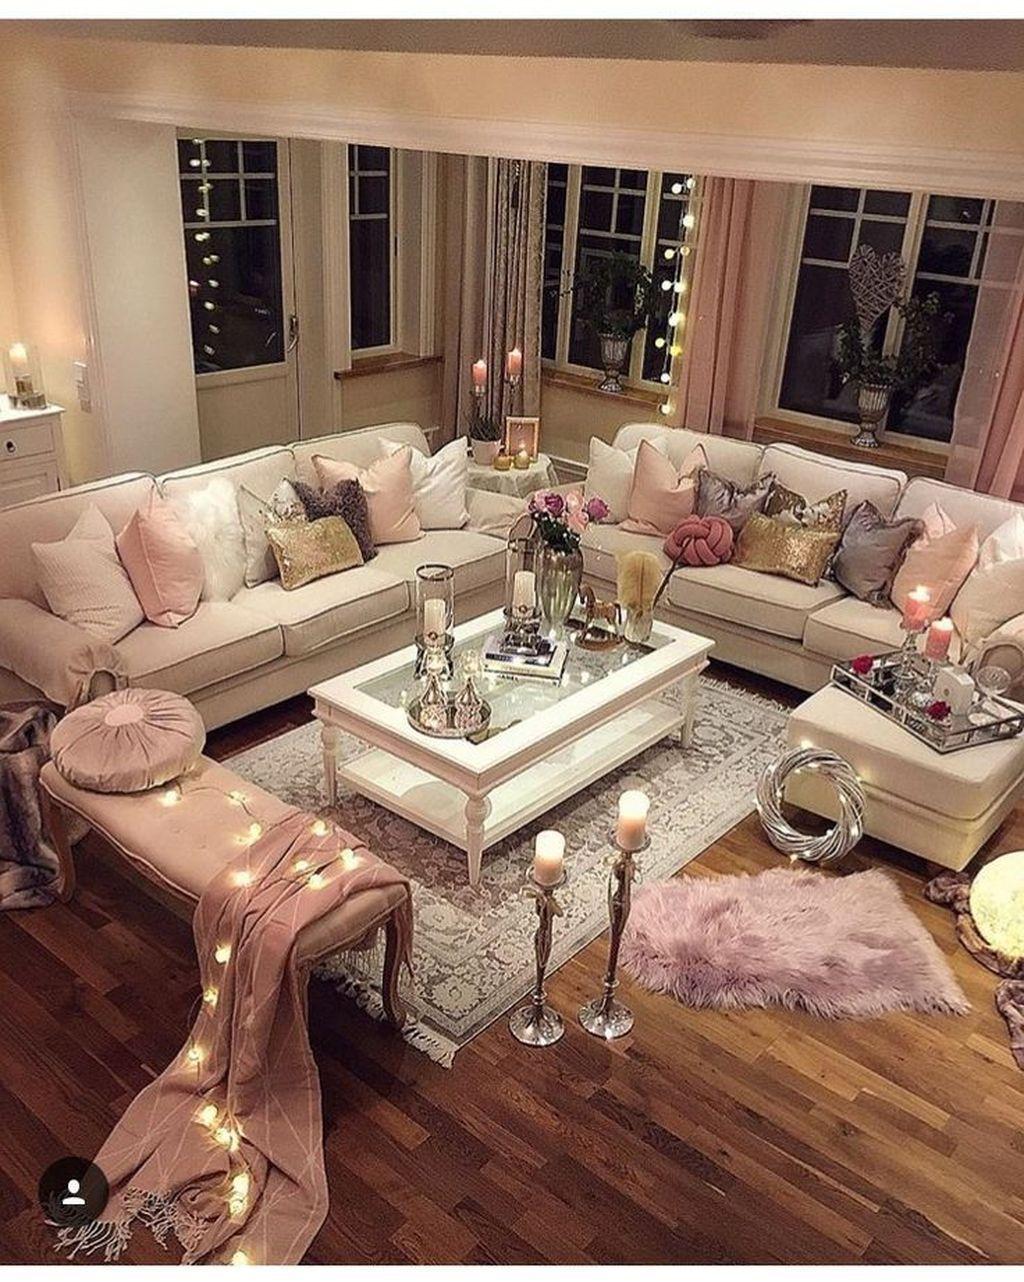 Nice Shabby Chic Living Room Decor You Need To Have Girly Living Room Pink Living Room Decor Chic Living Room Decor #shabby #chic #living #room #decorating #ideas